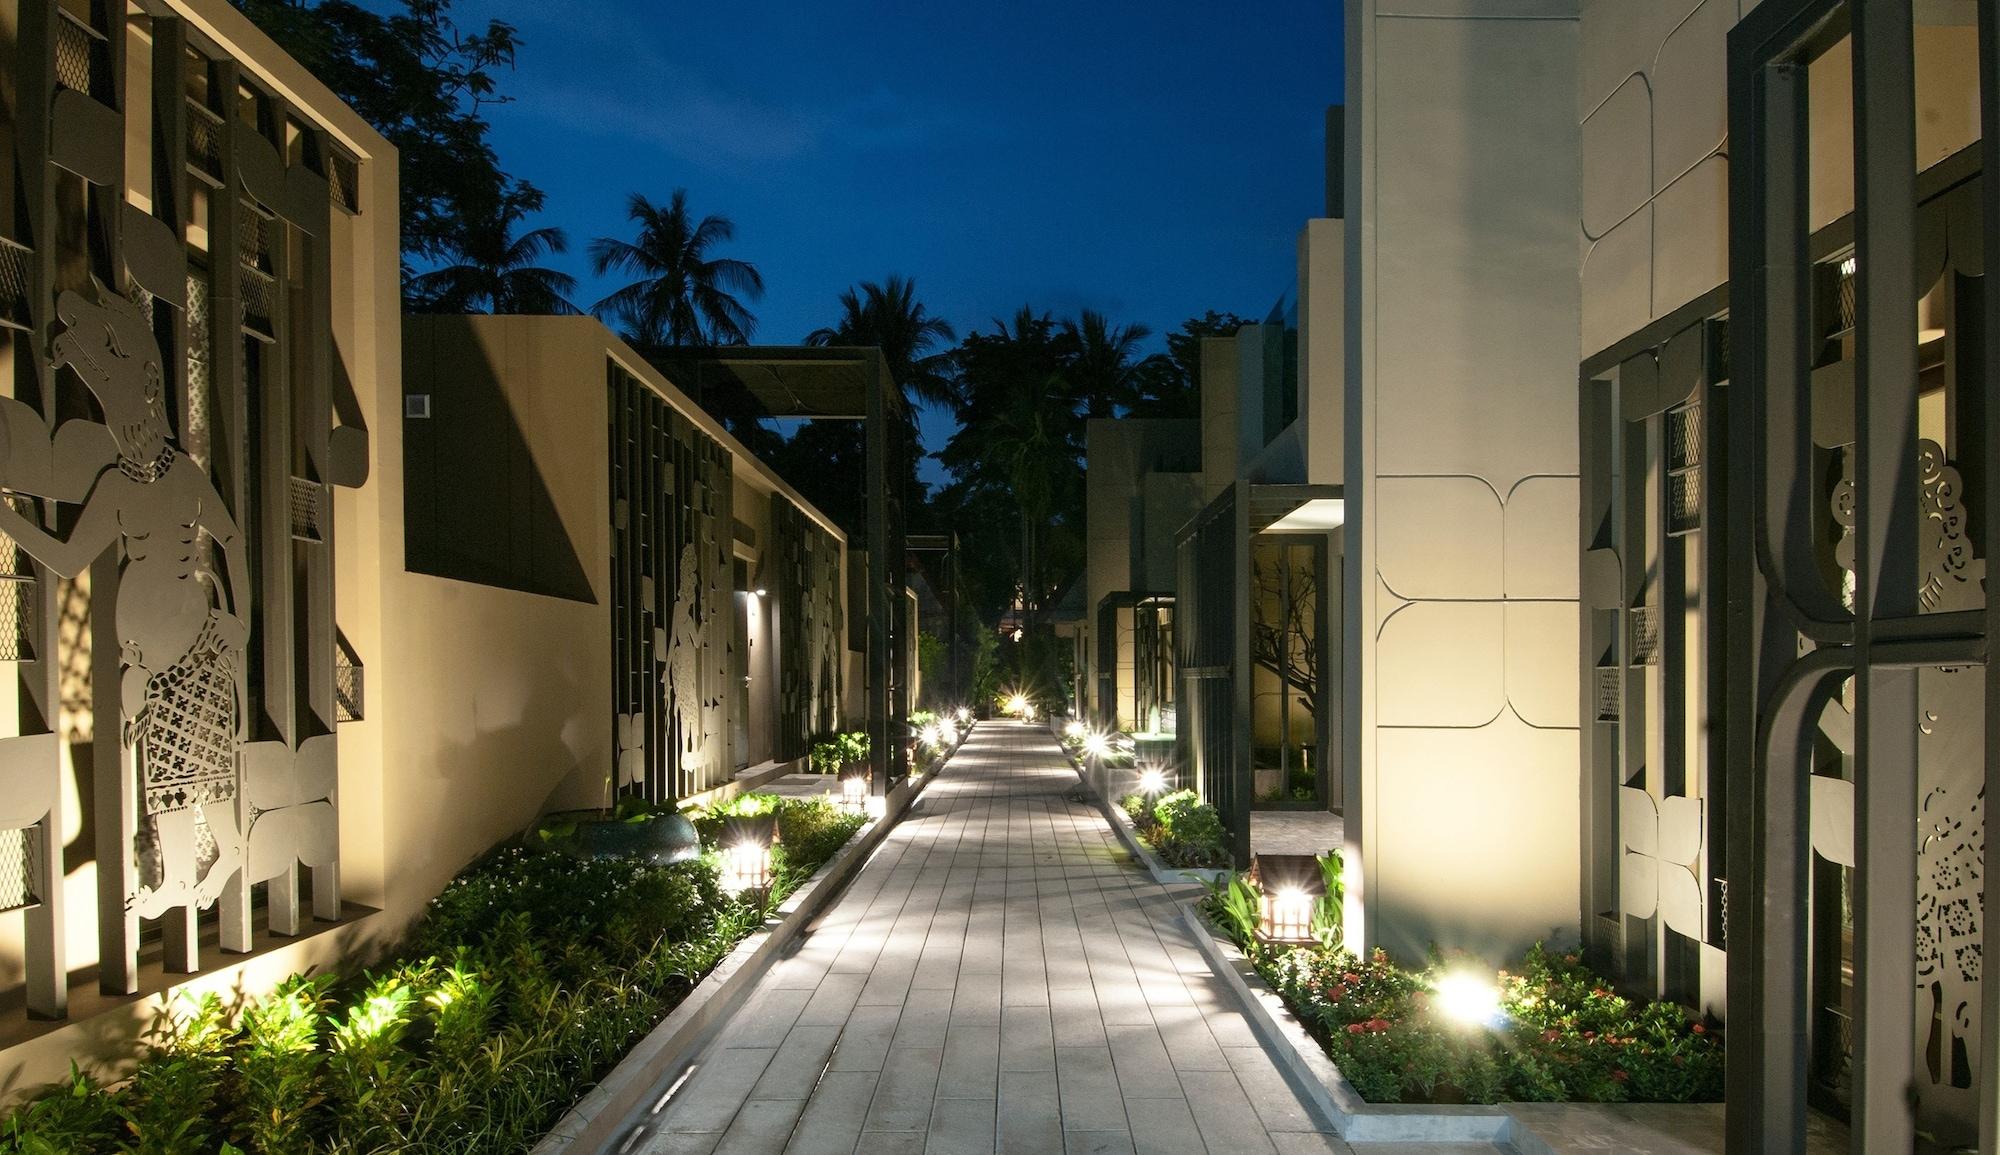 Executive Pool Villa by Baan Haad Ngam, Ko Samui